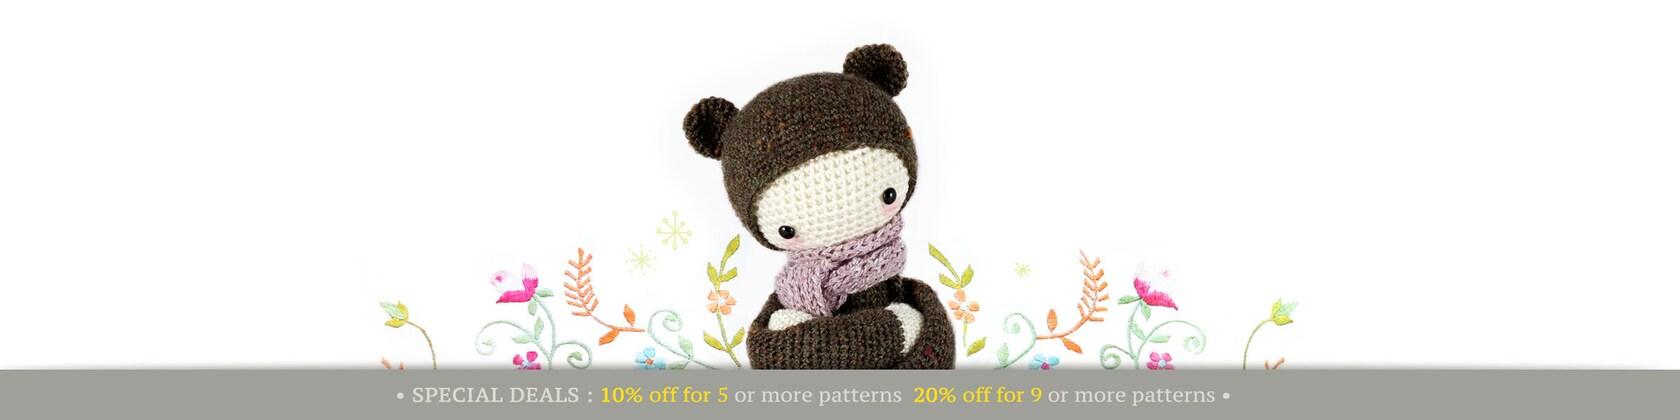 Crochet patterns for handmade dolls by lalylala on Etsy